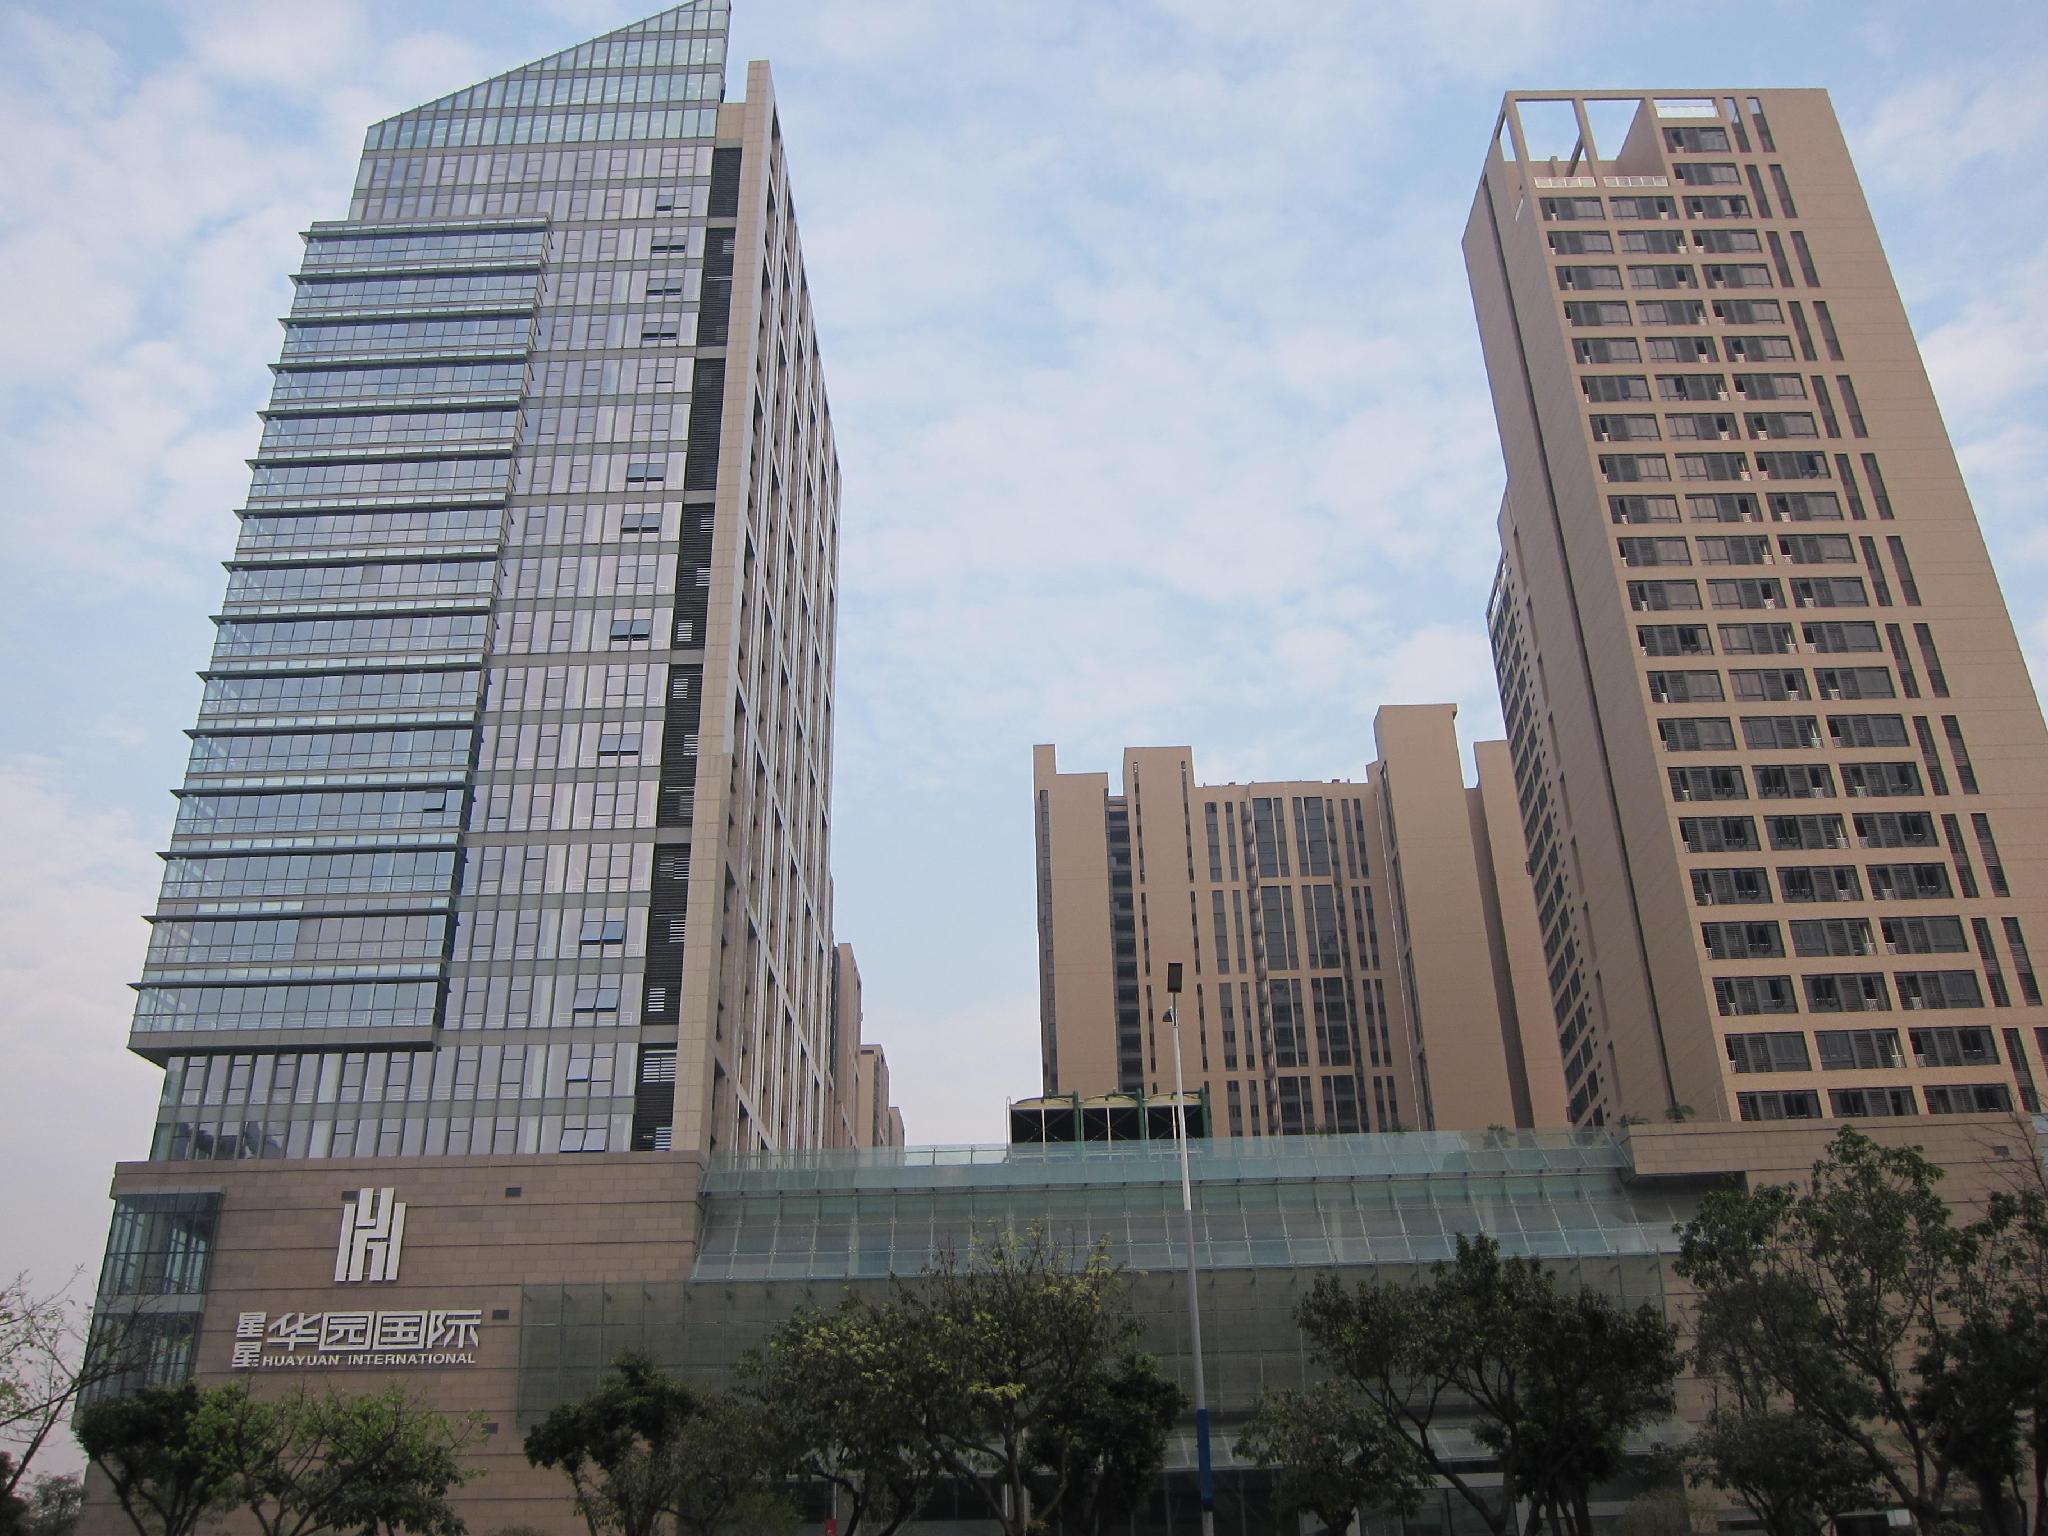 Private ApartmentHuayuan International - Foshan